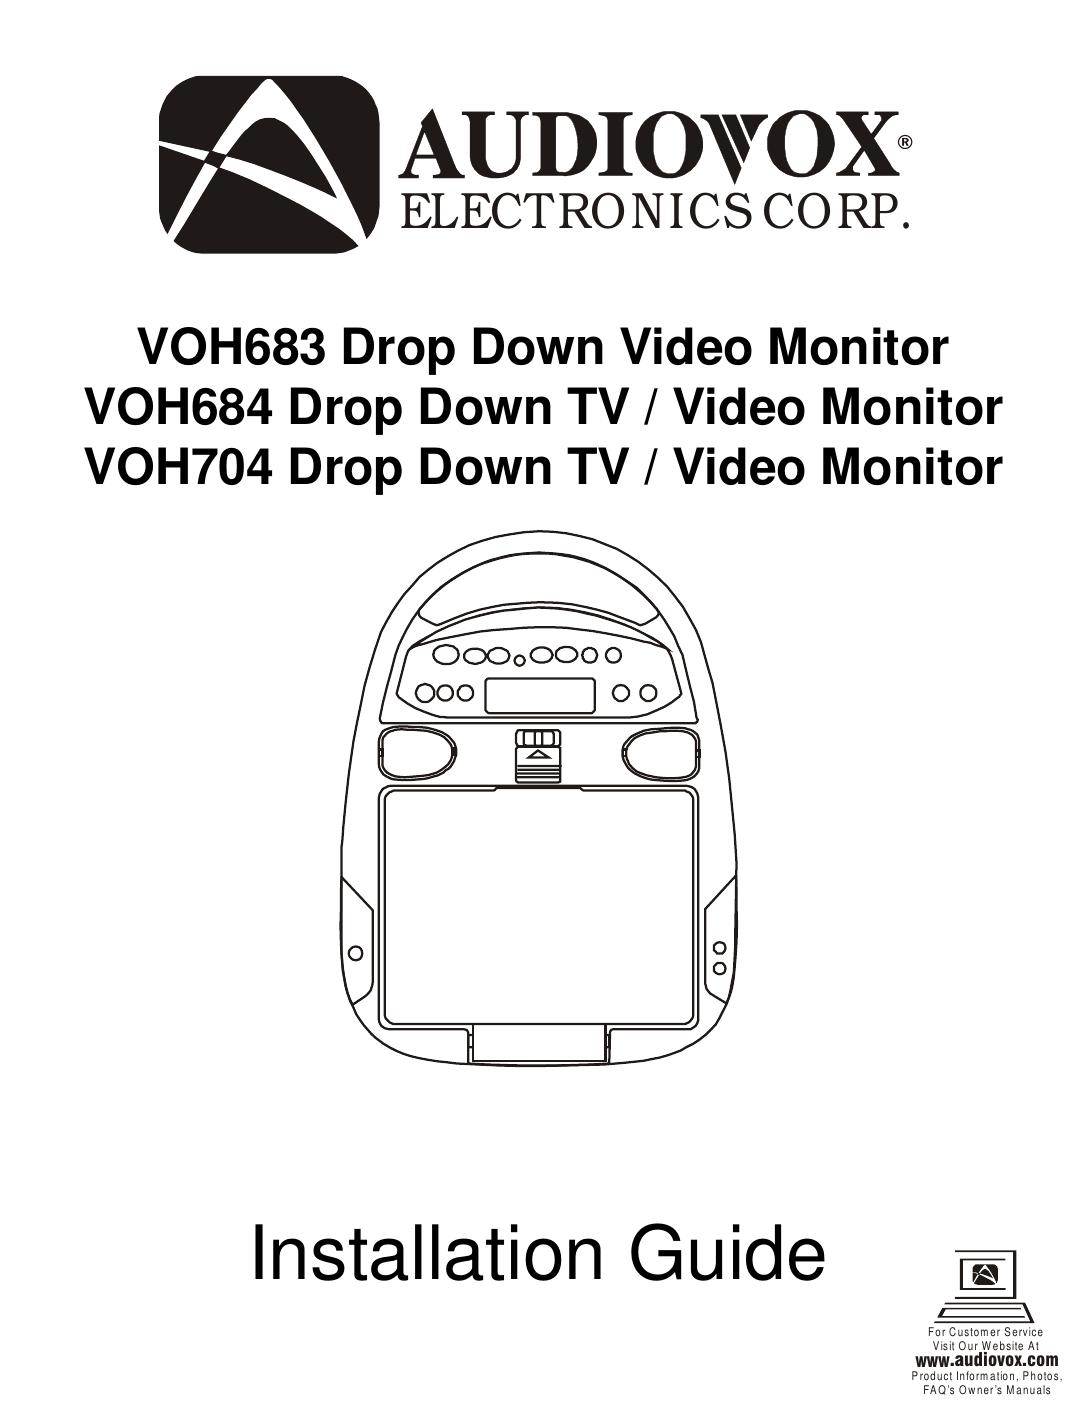 audiovox service manuals